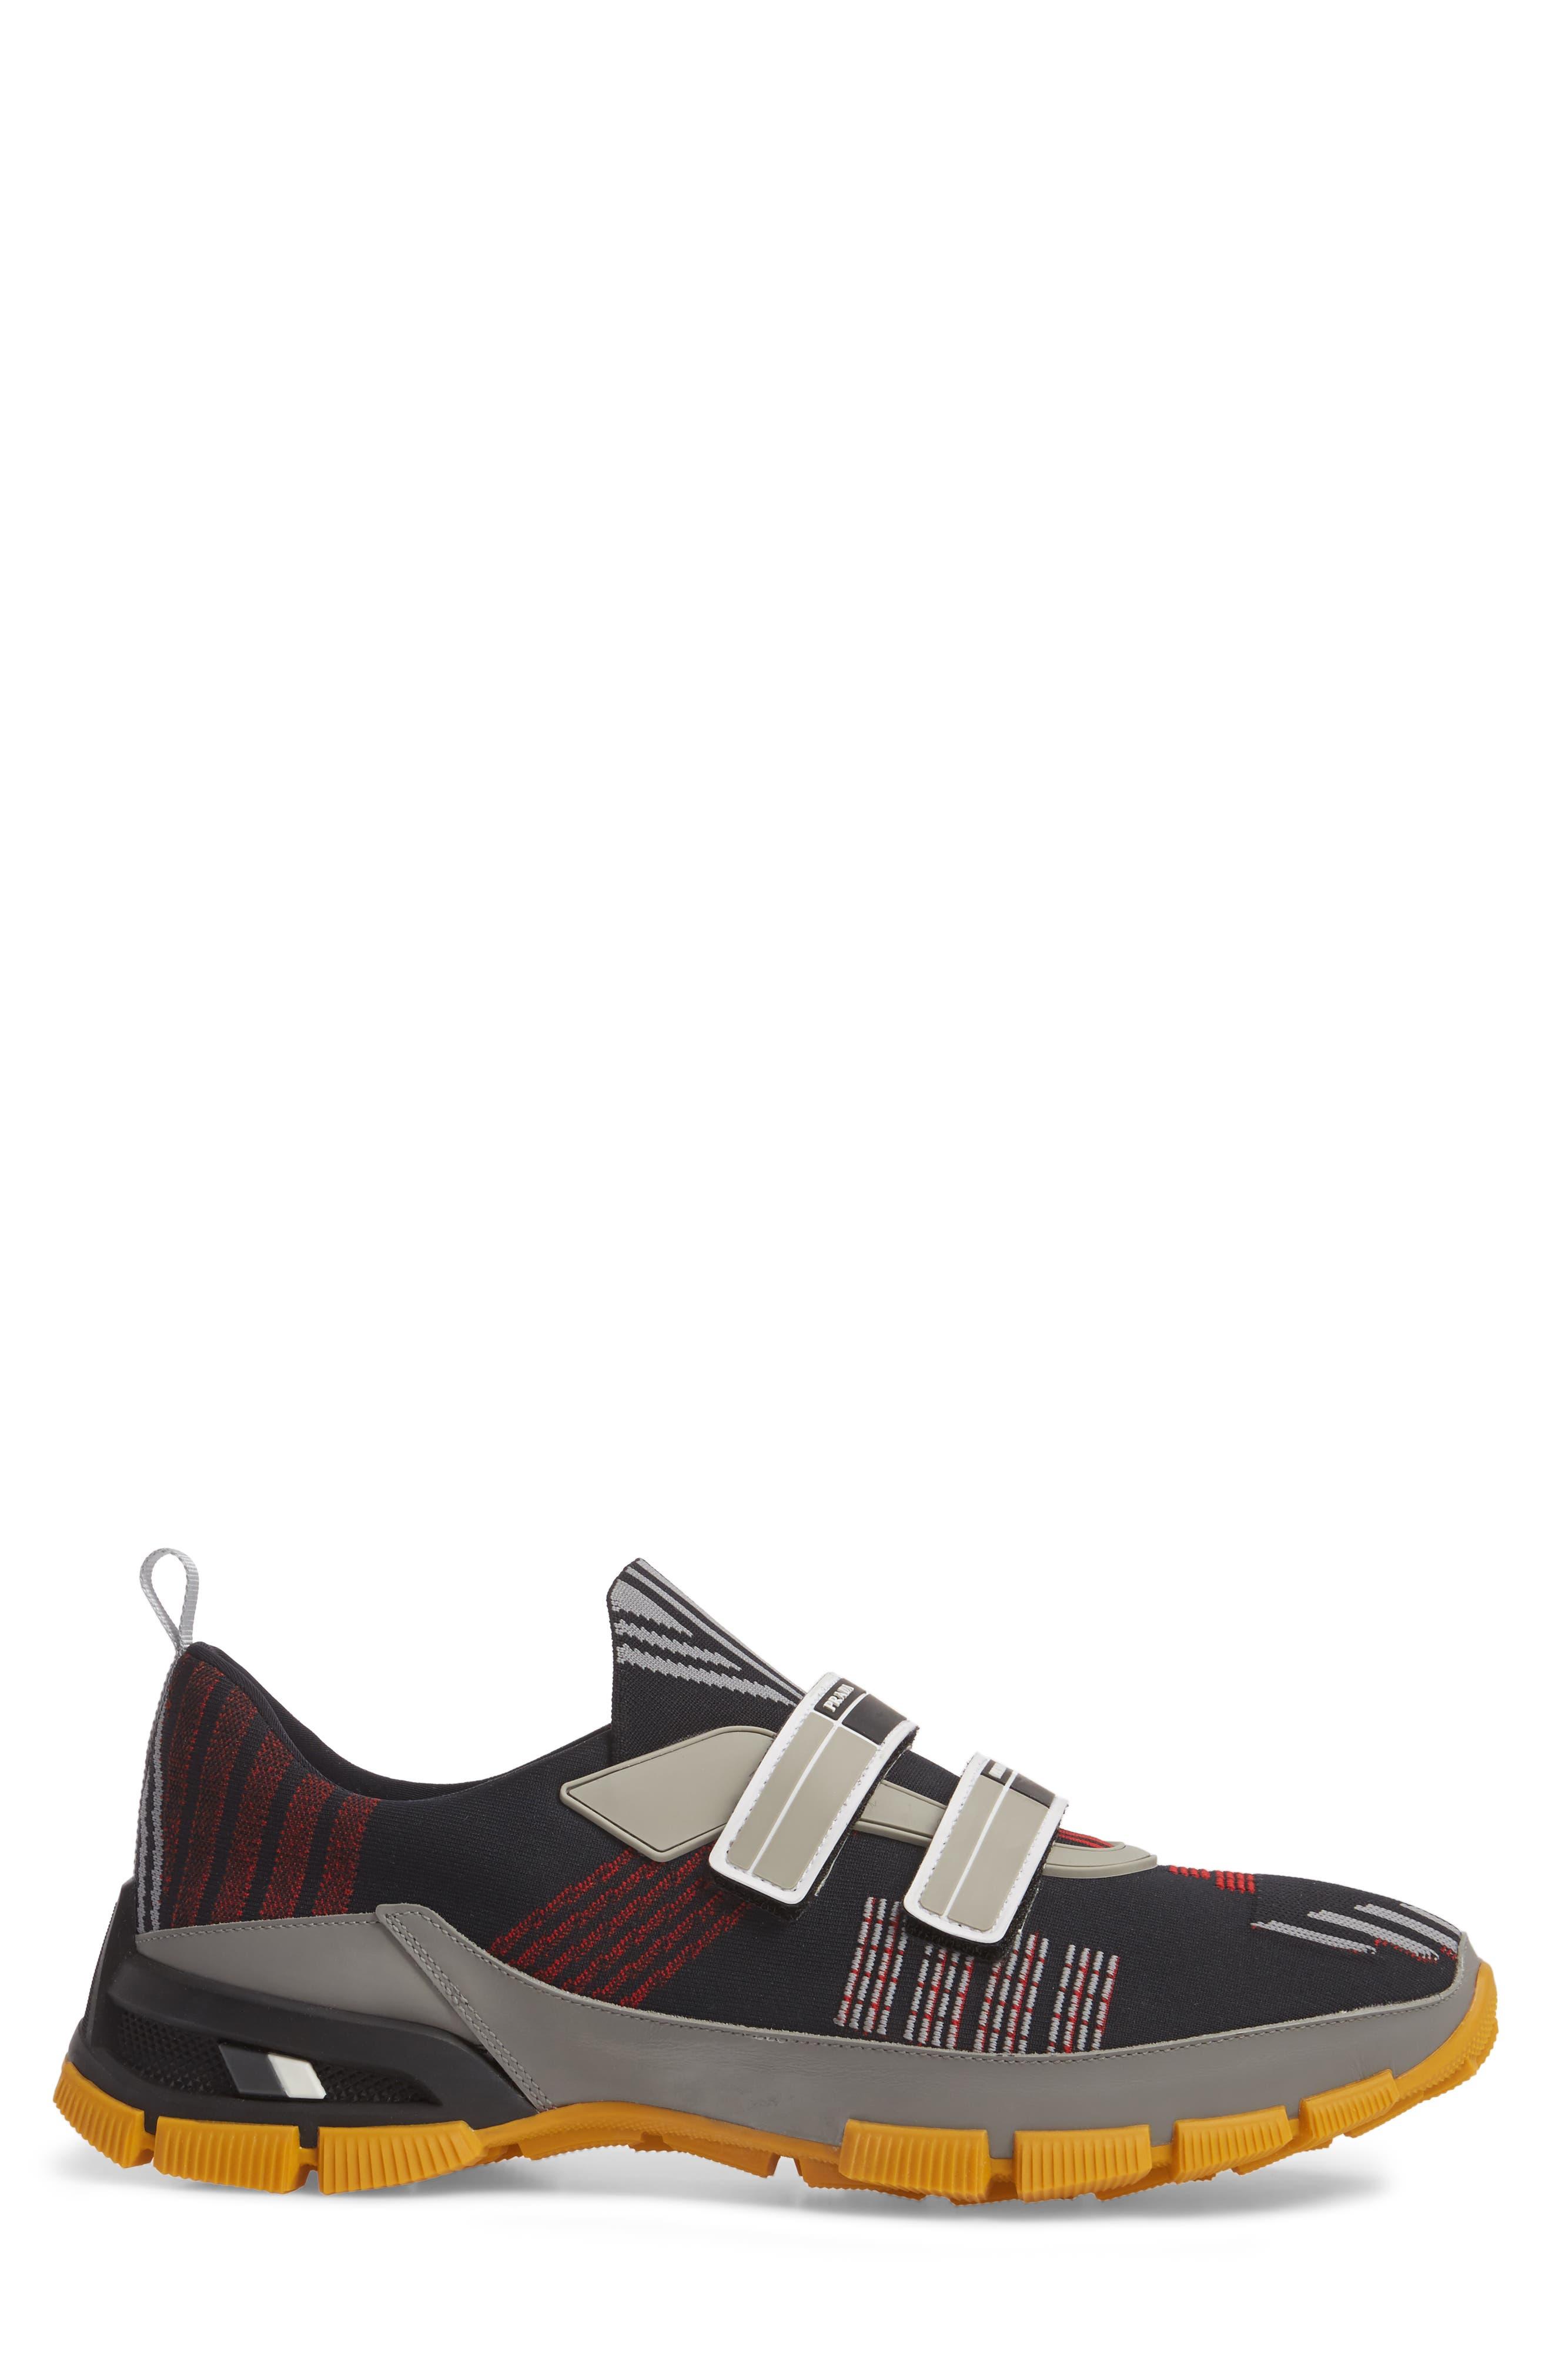 Linea Rossa Strap Sneaker,                             Alternate thumbnail 5, color,